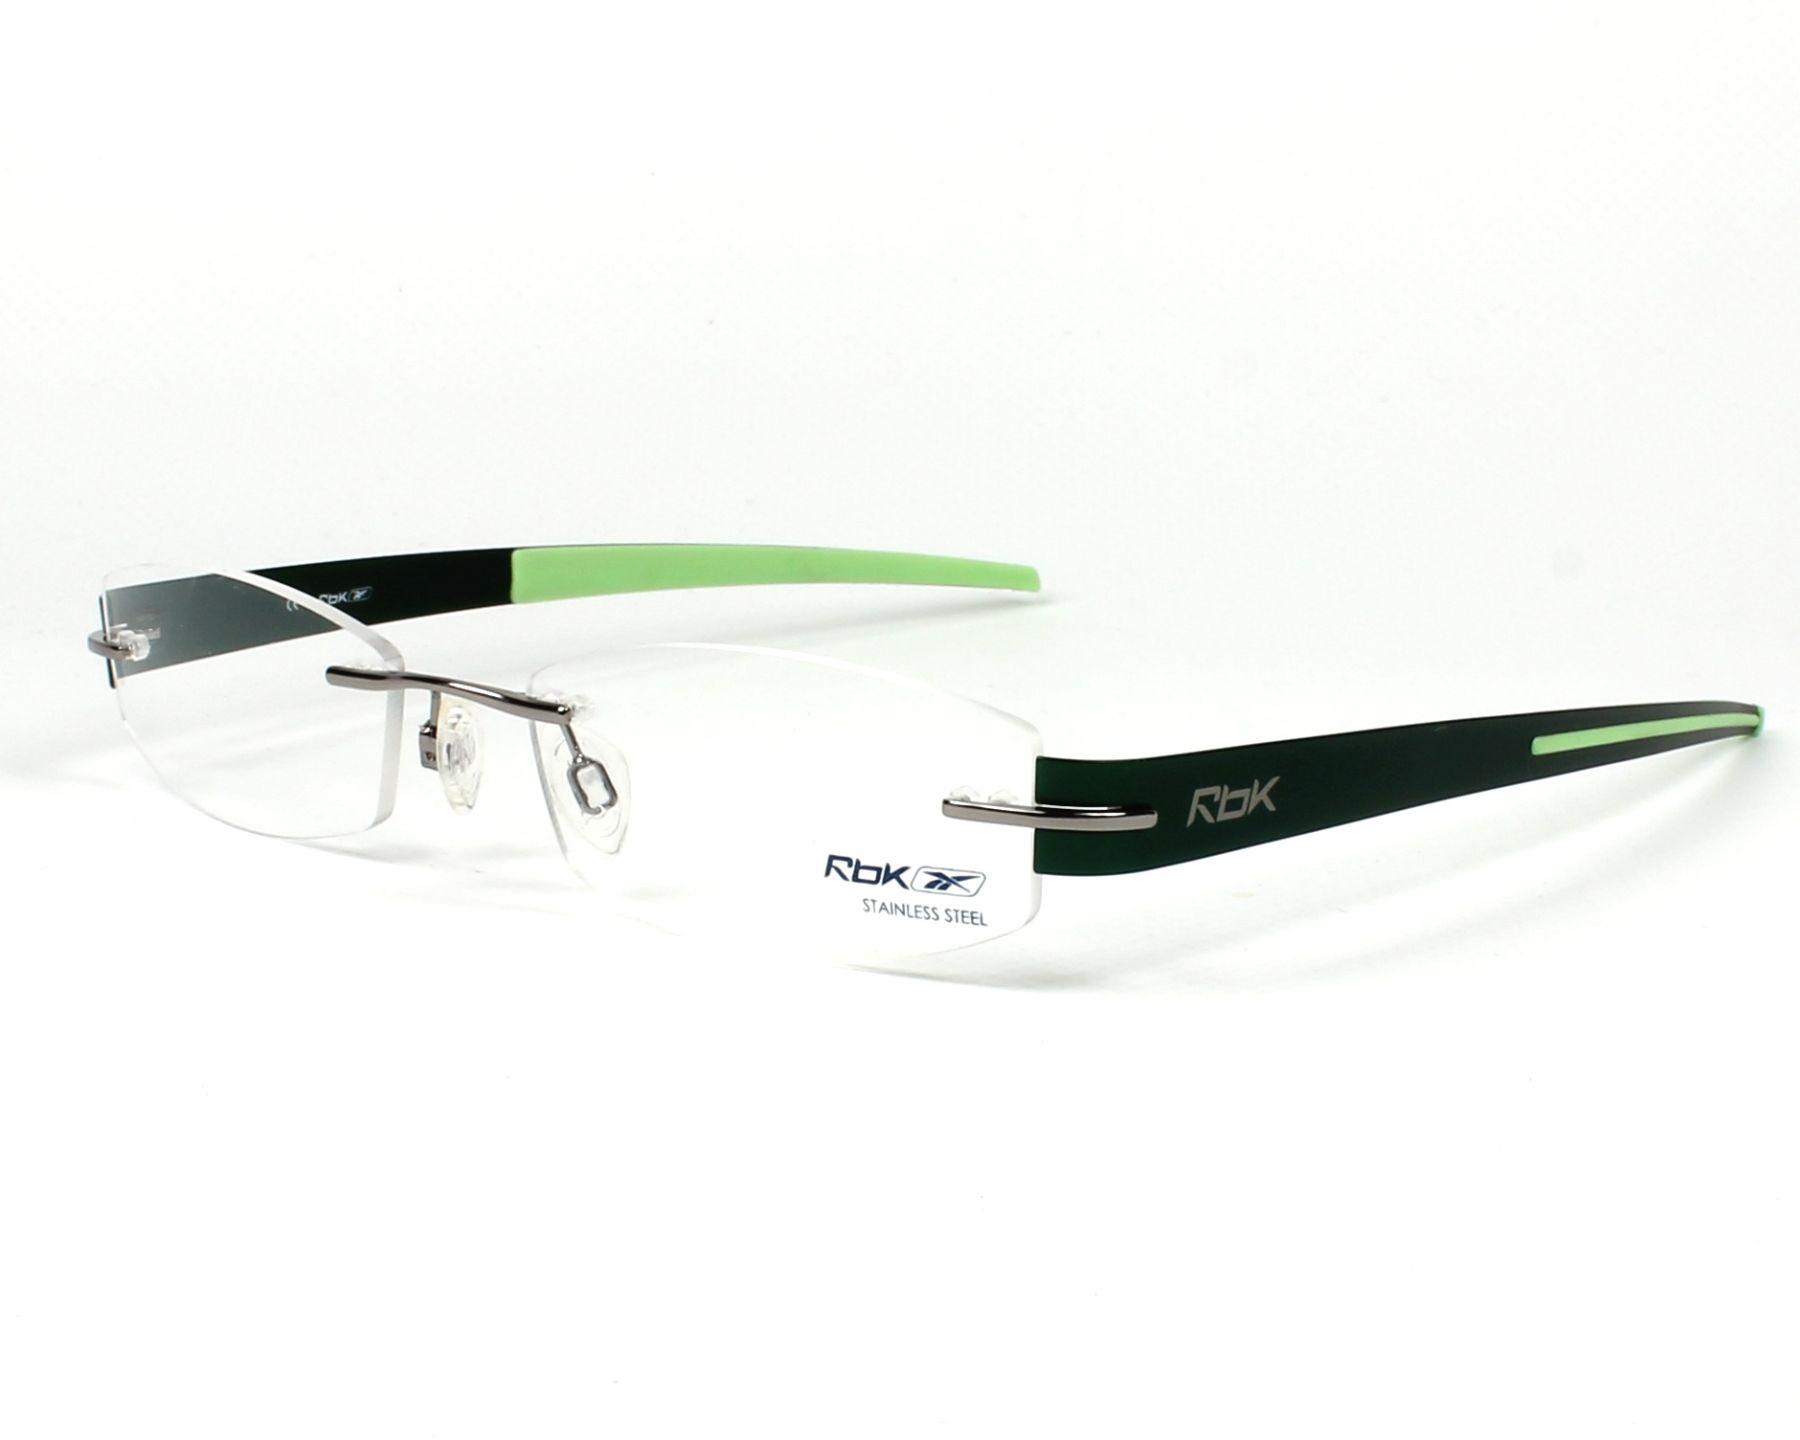 reebok lunettes femme verte